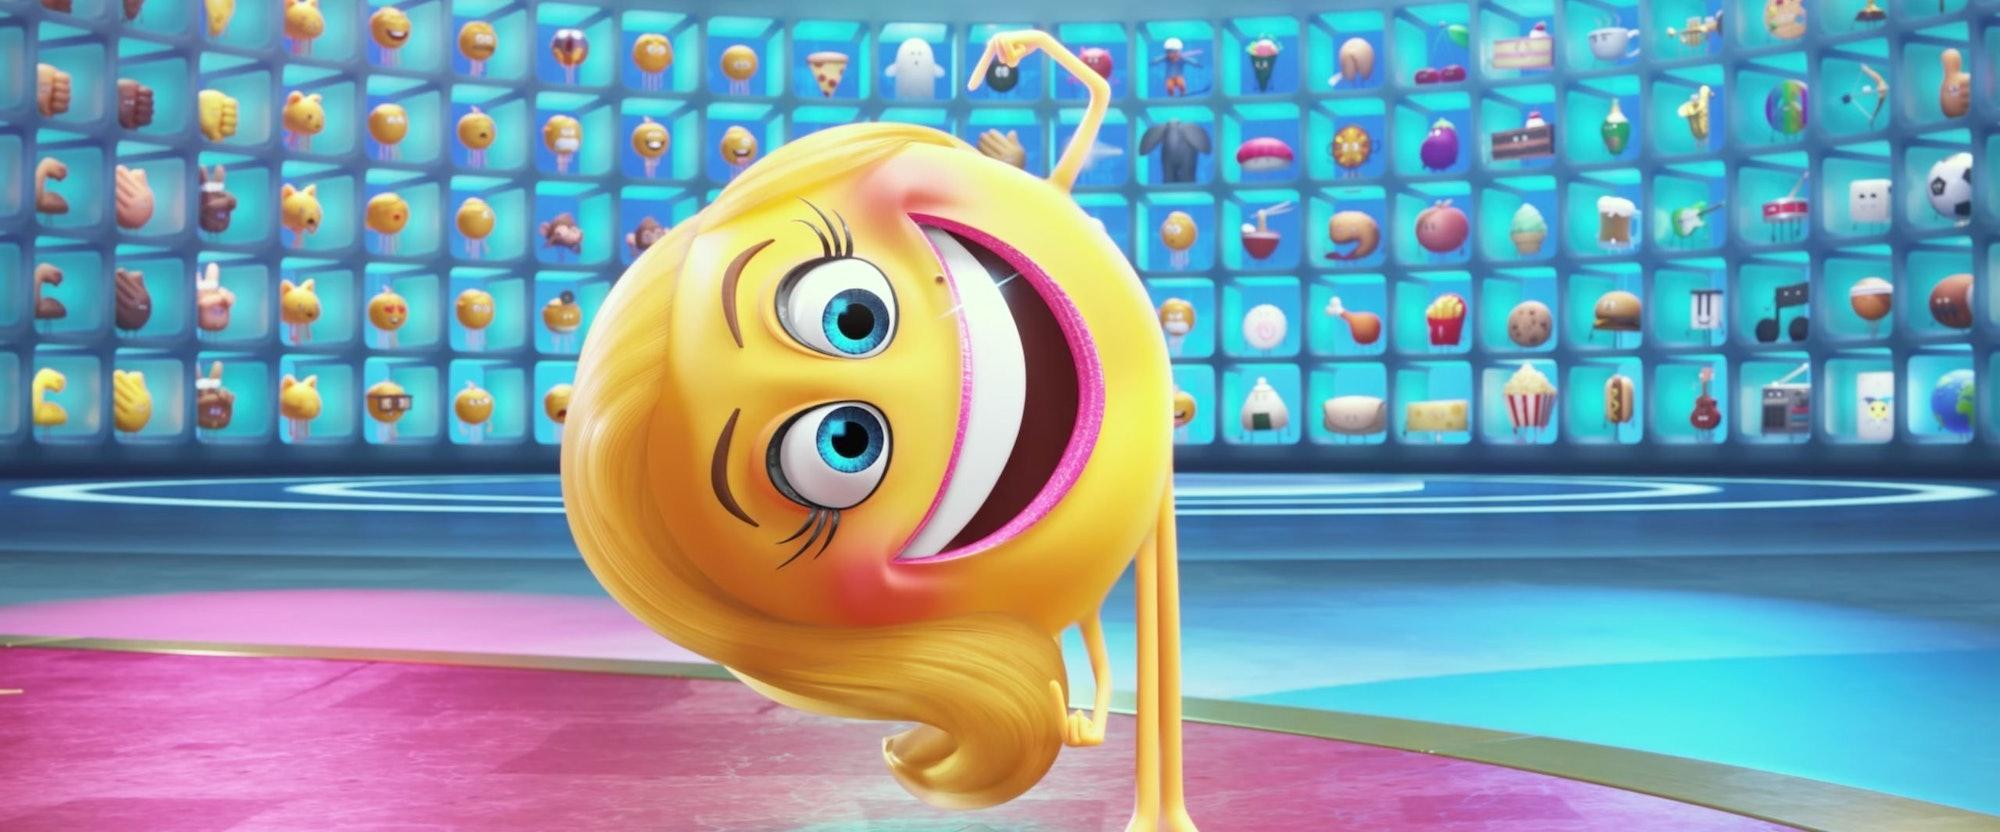 emoji movie maya rudolph